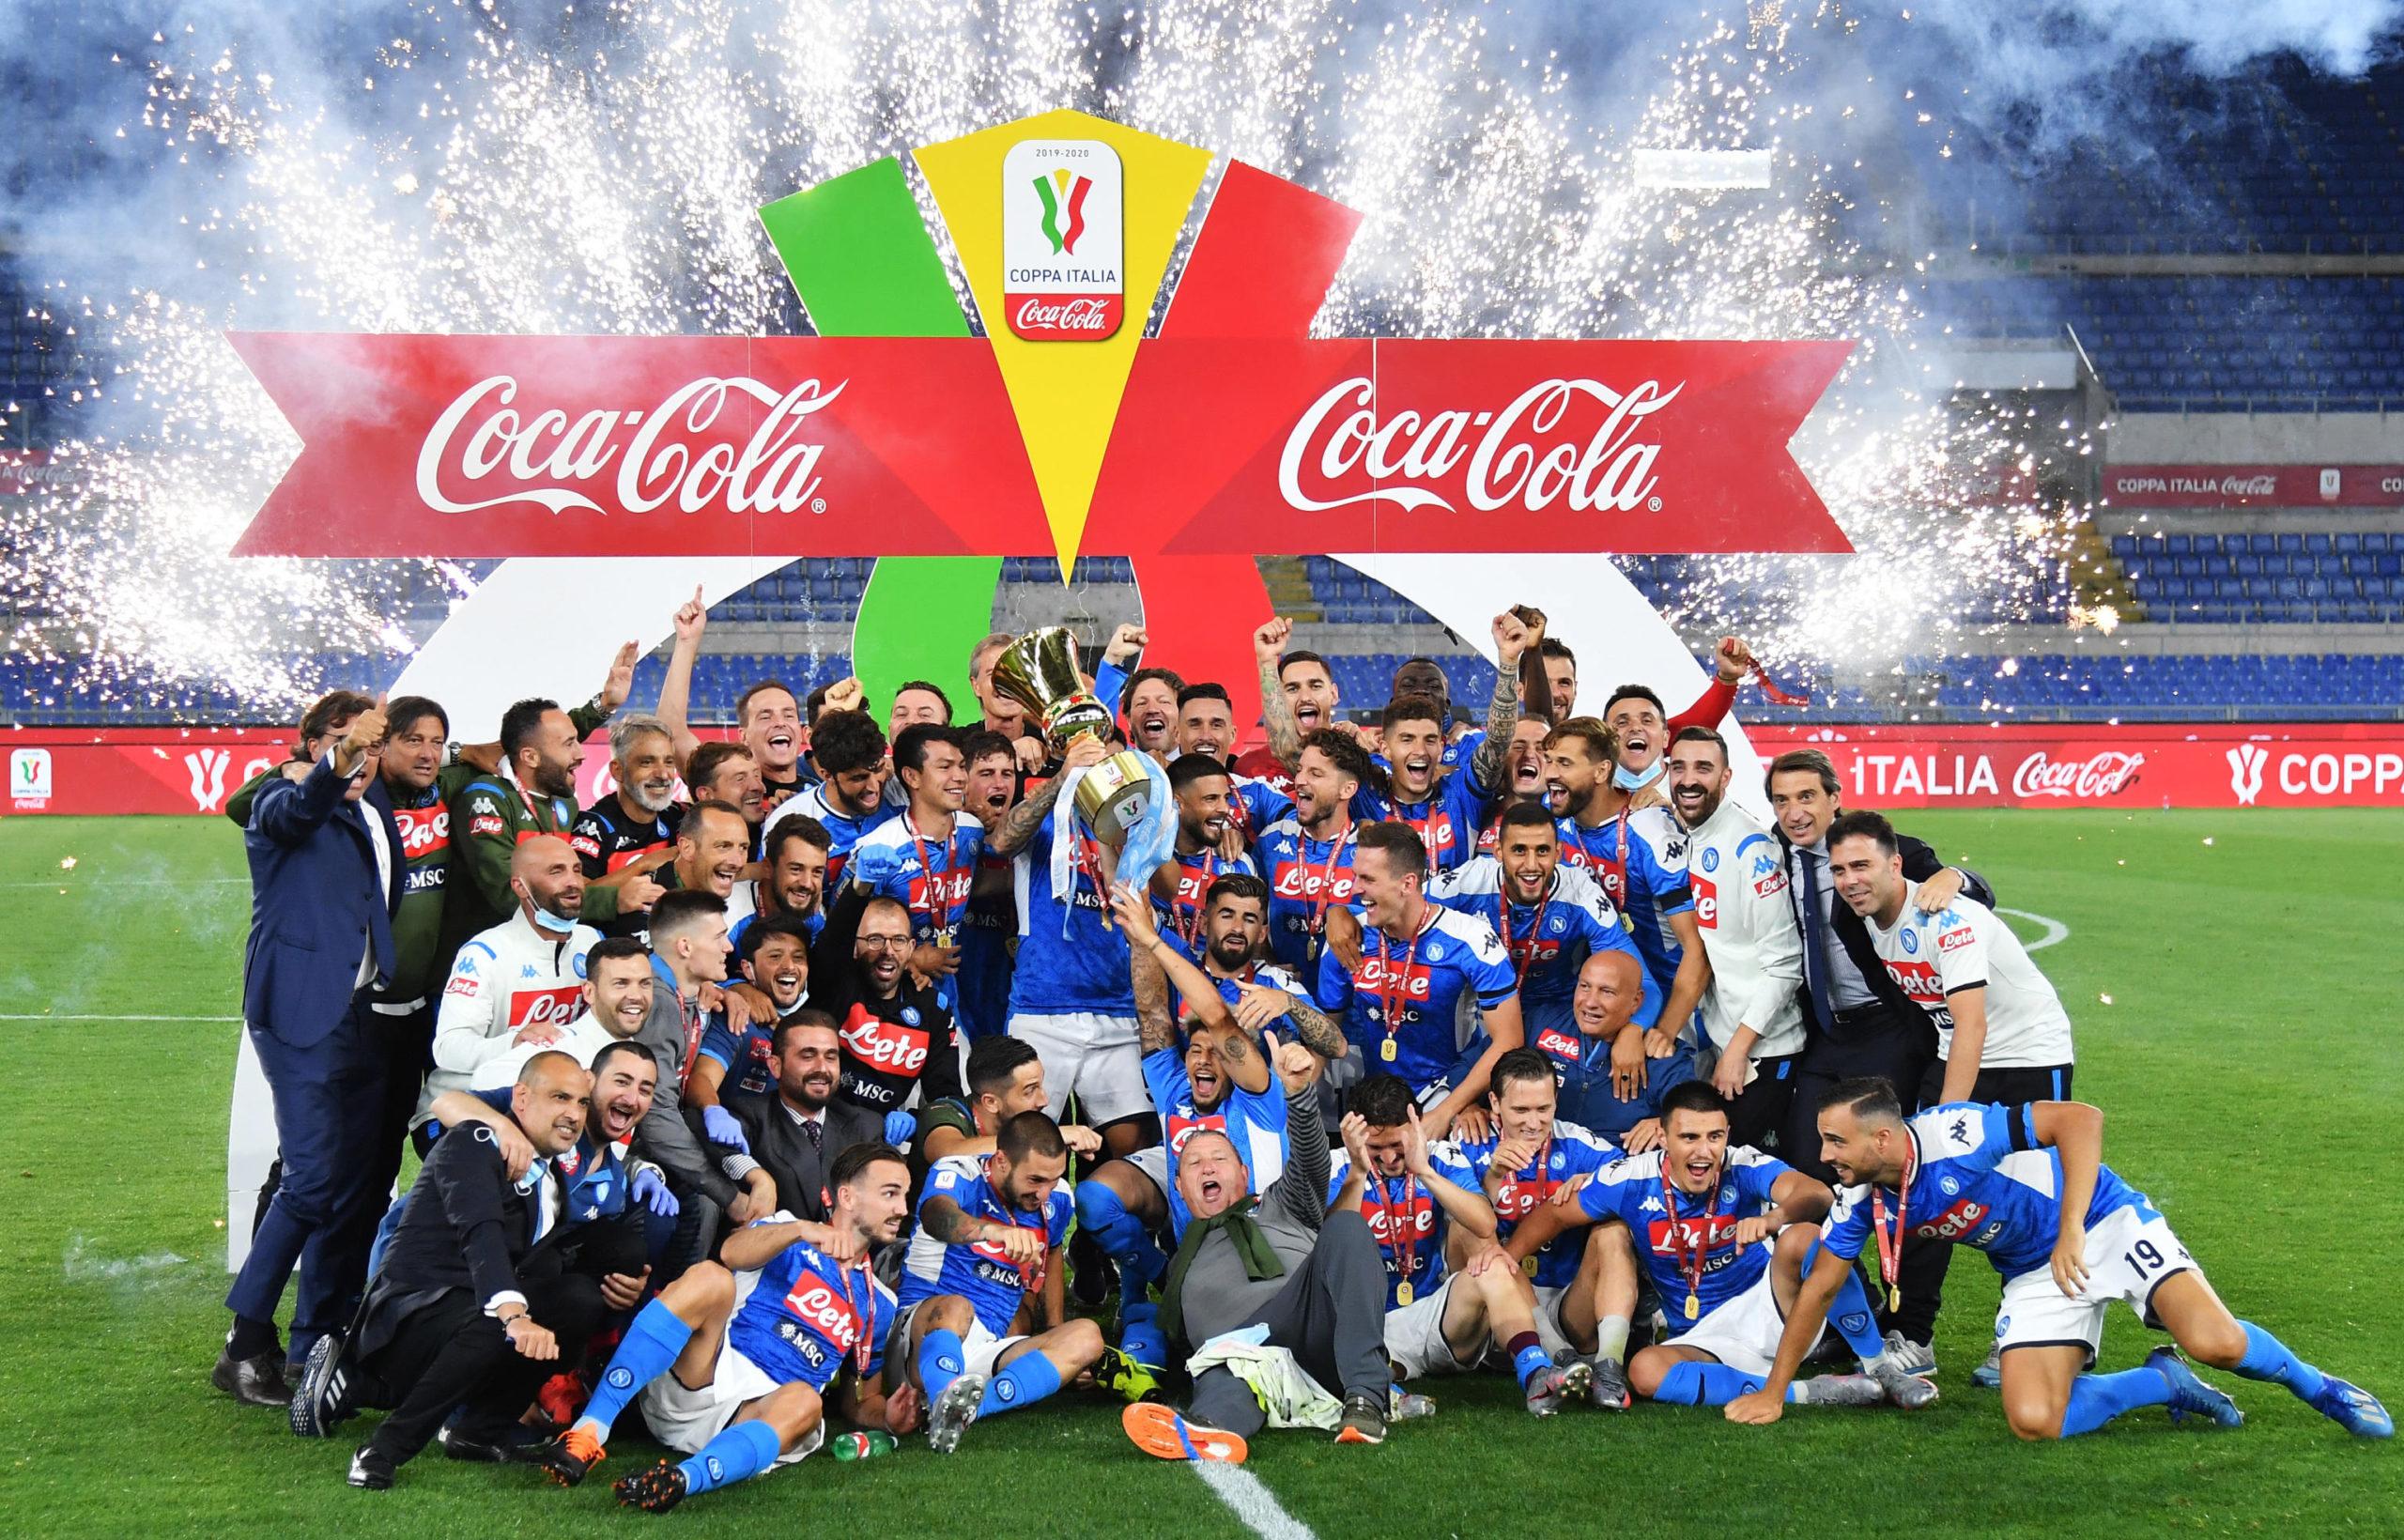 Players of Napoli celebrate with the Coppa Italia